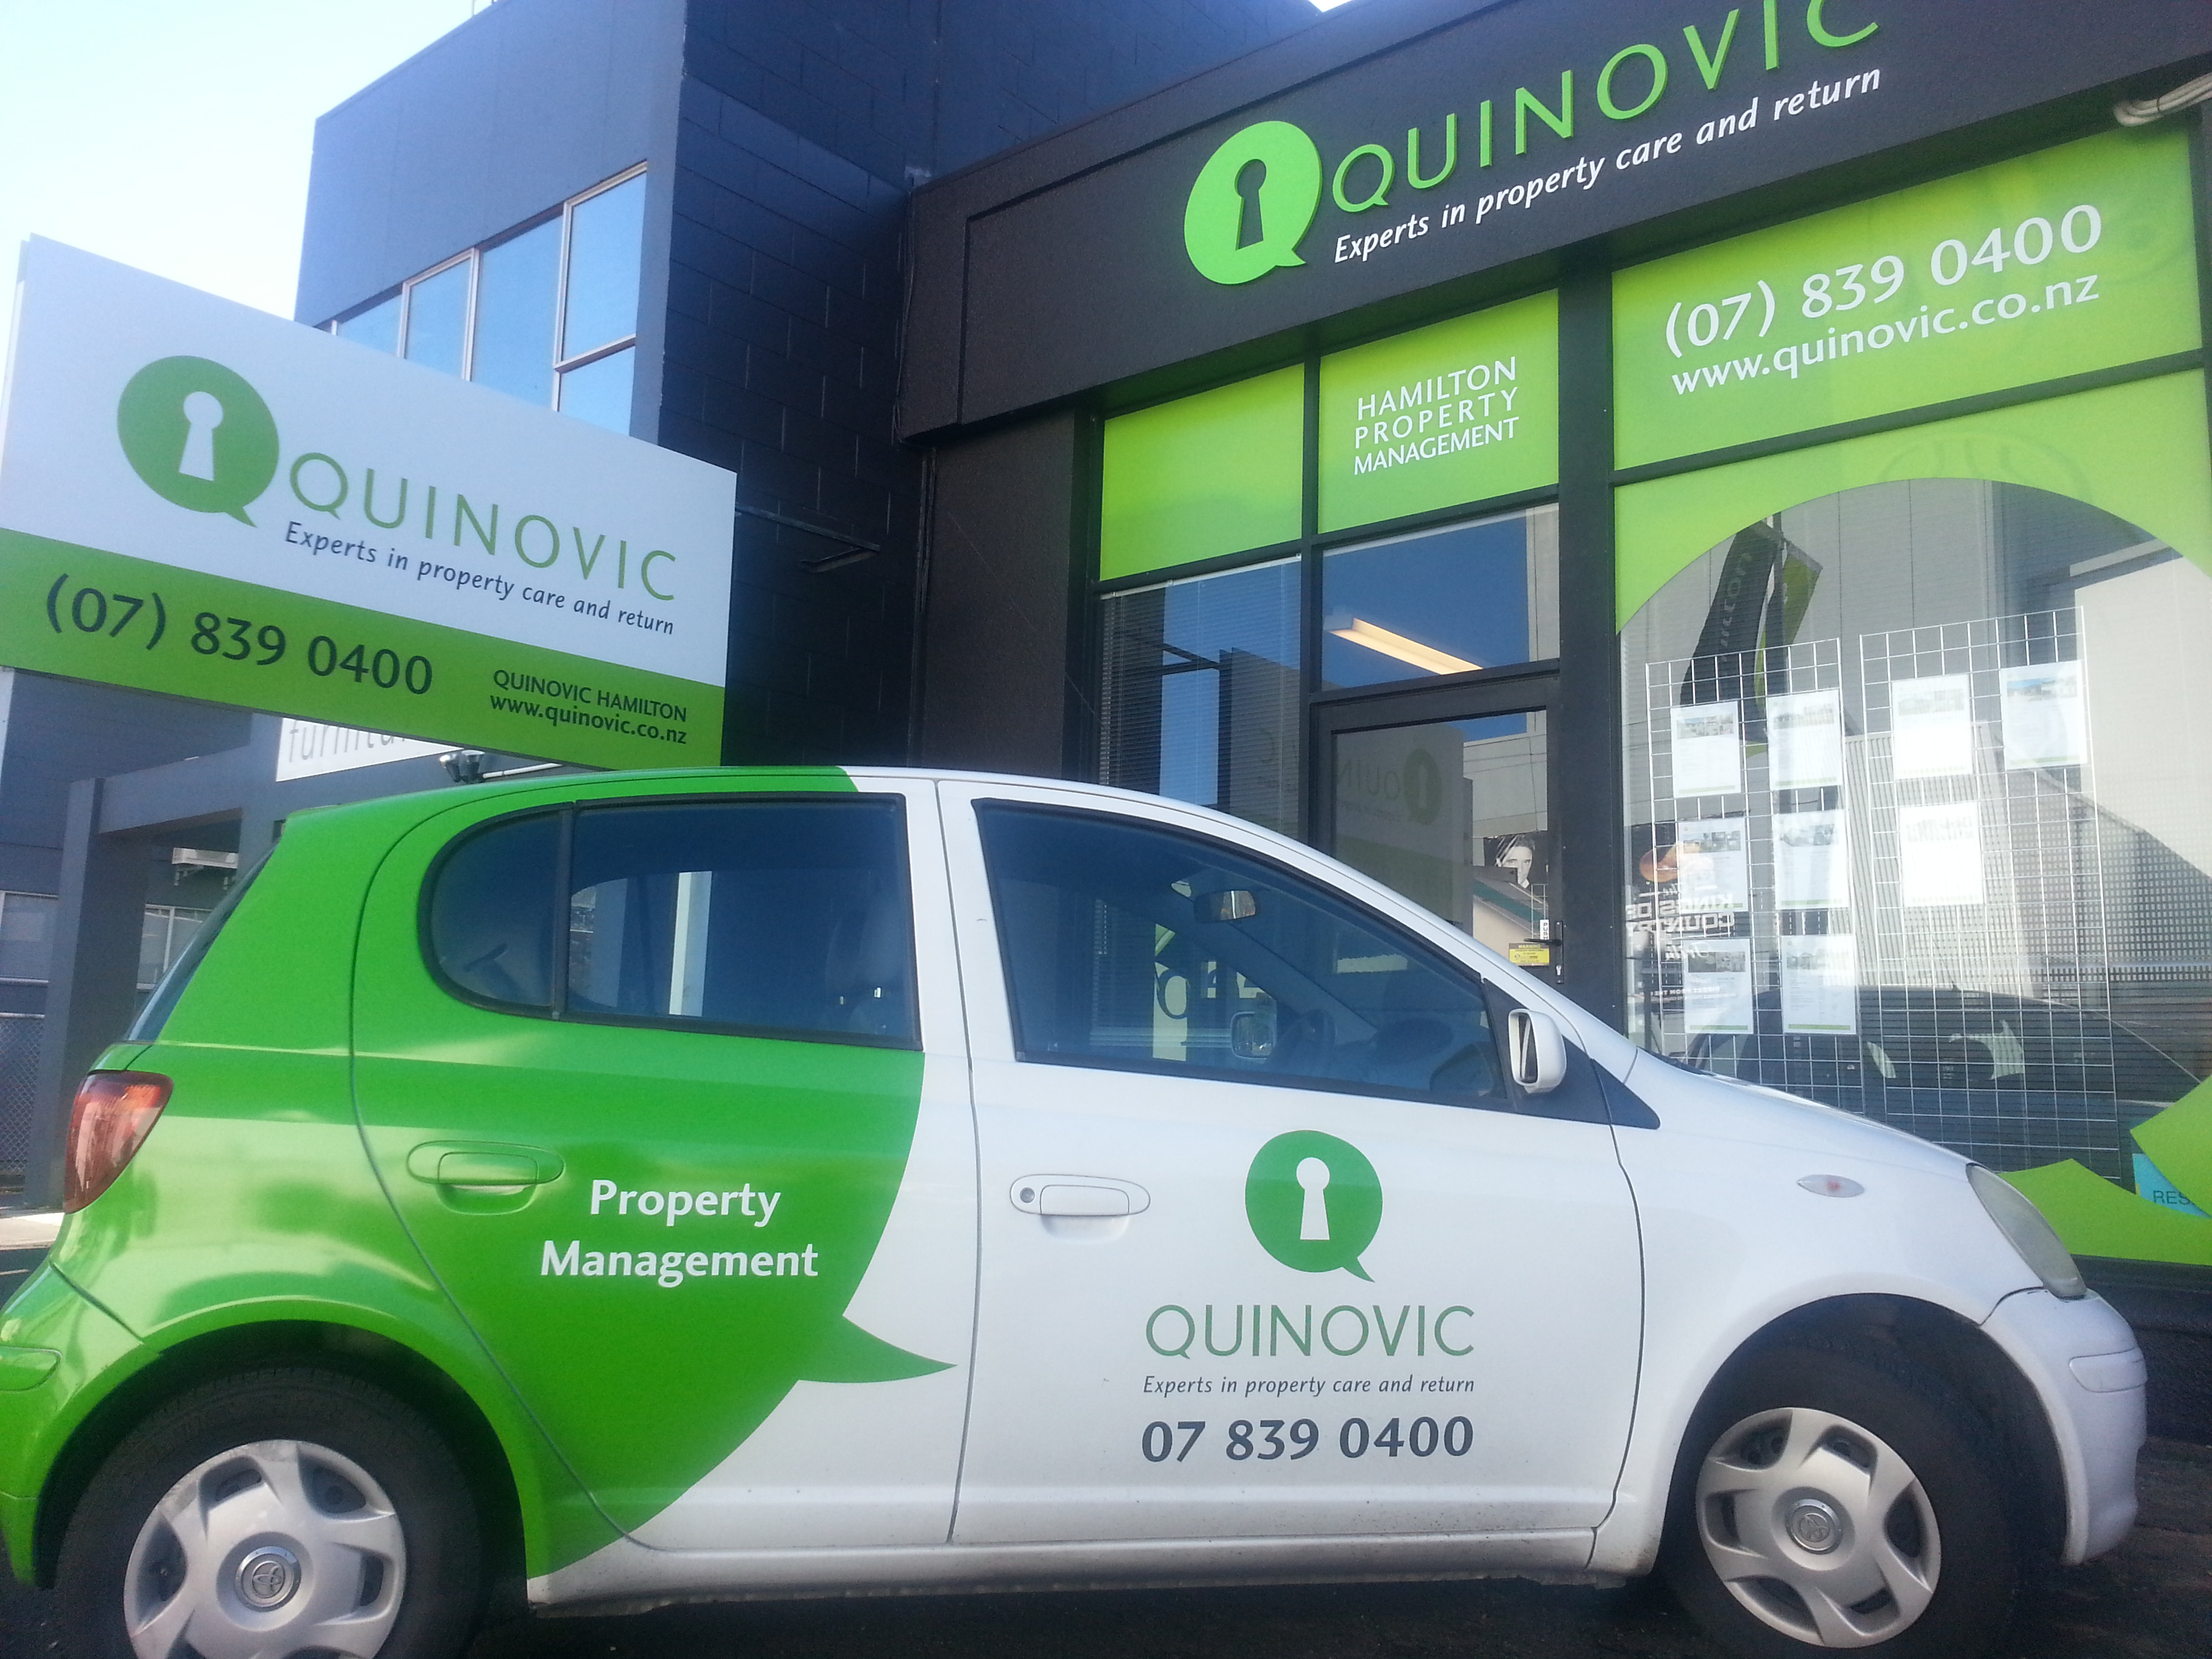 Quinovic Property Management - Hamilton, Waikato